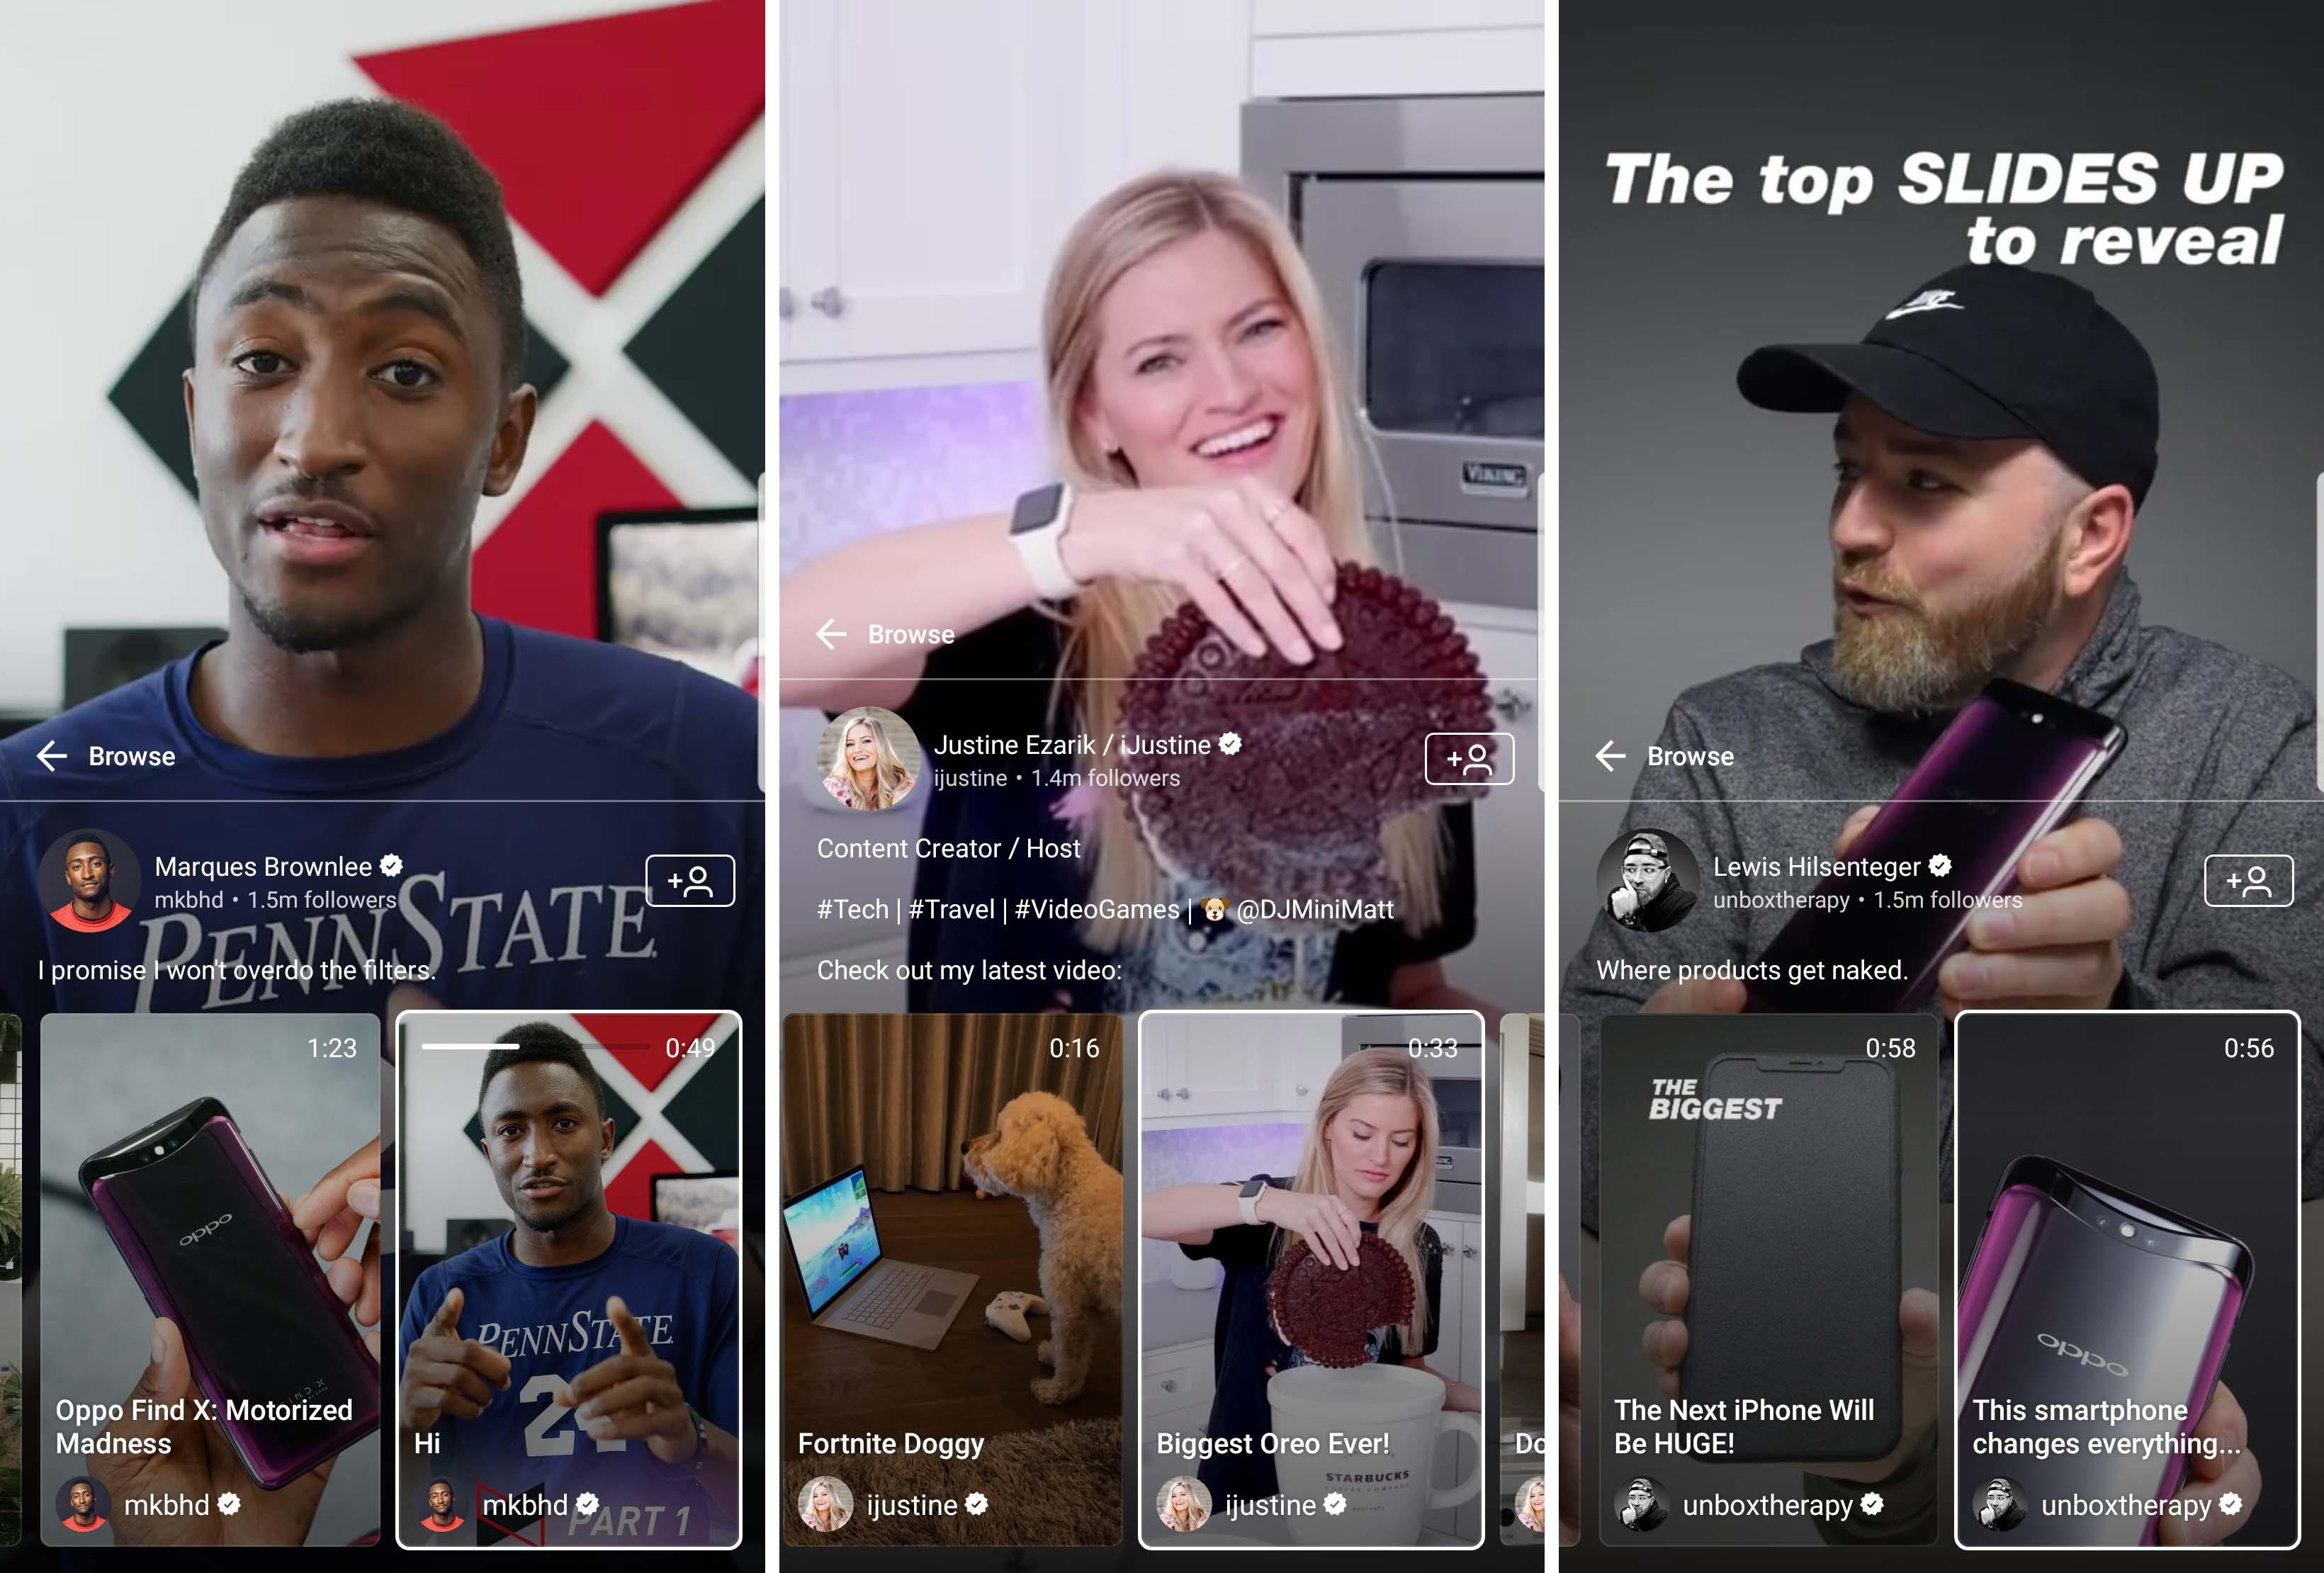 Youtubers on IGTV ( Marques Brownlee, Justine Ezarik, Lewis Hilsenteger ) - createsyou.com